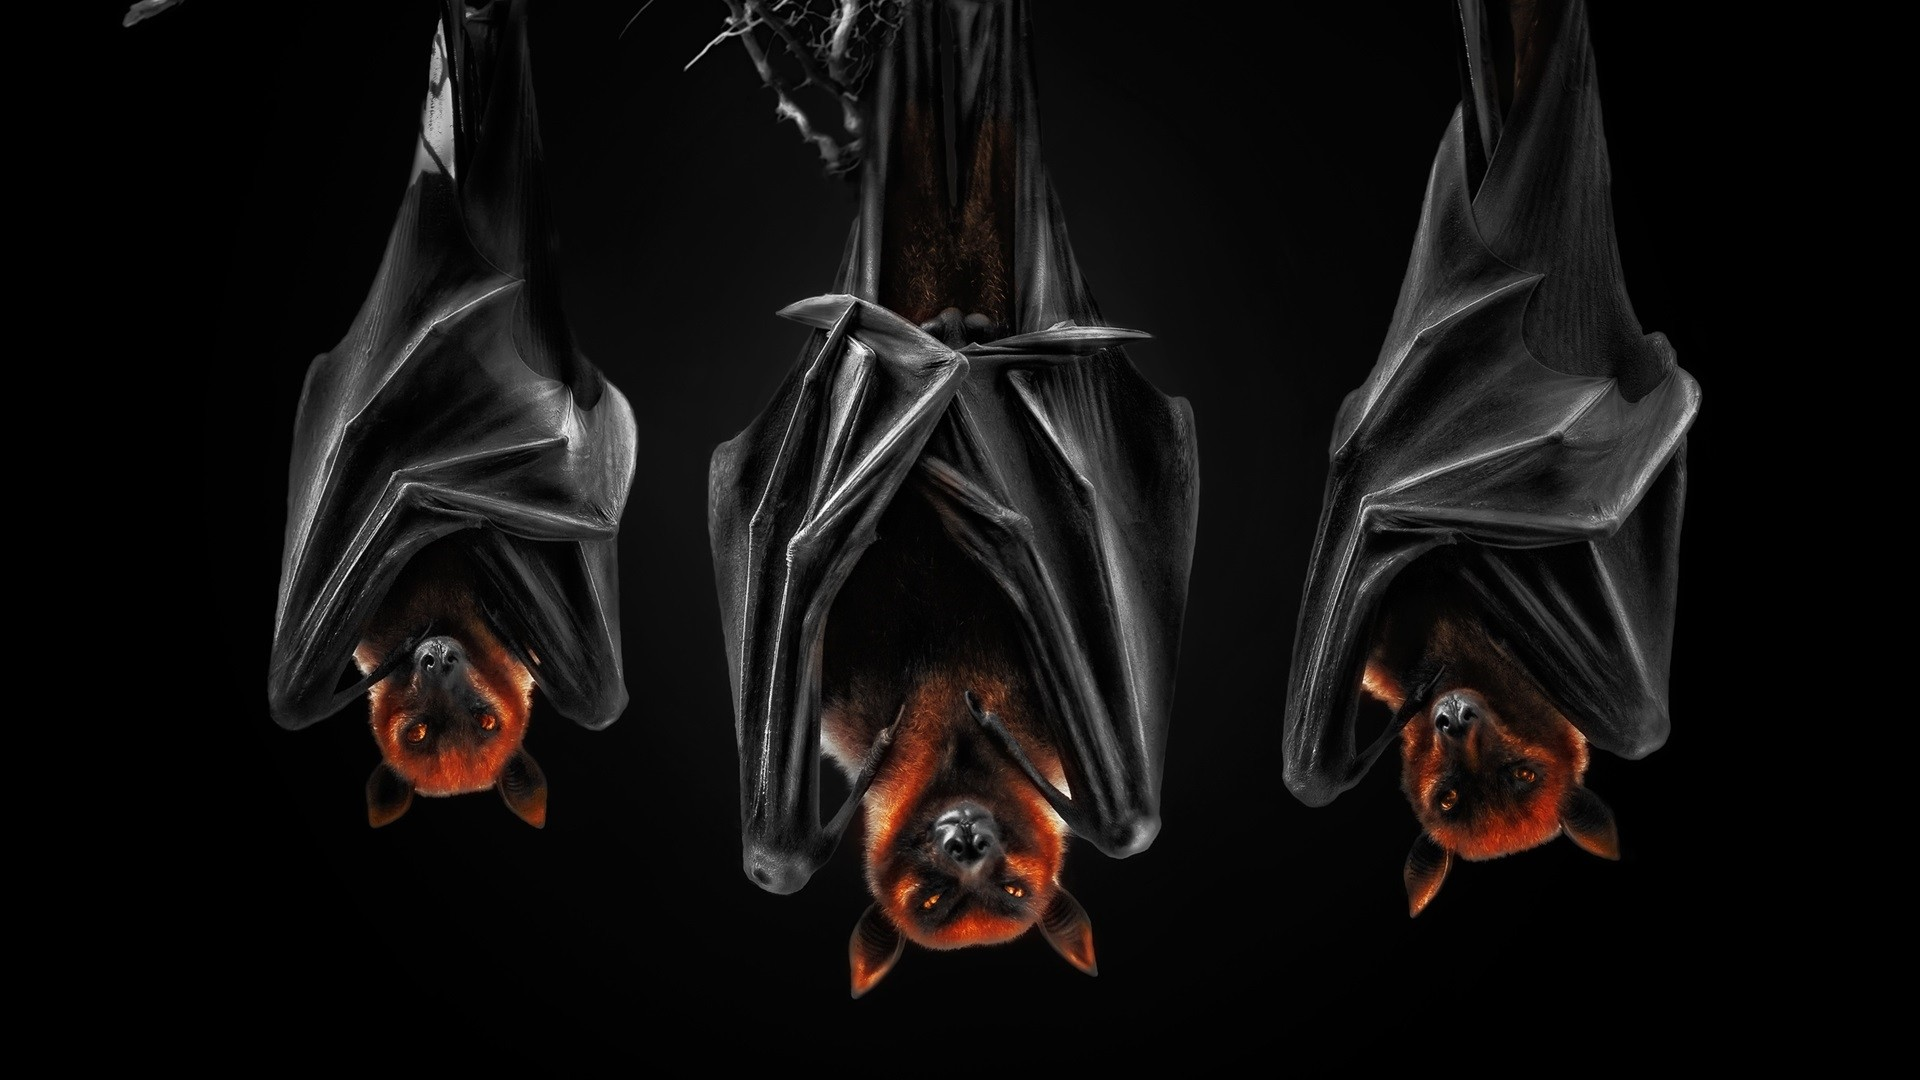 Bat Wallpaper image hd